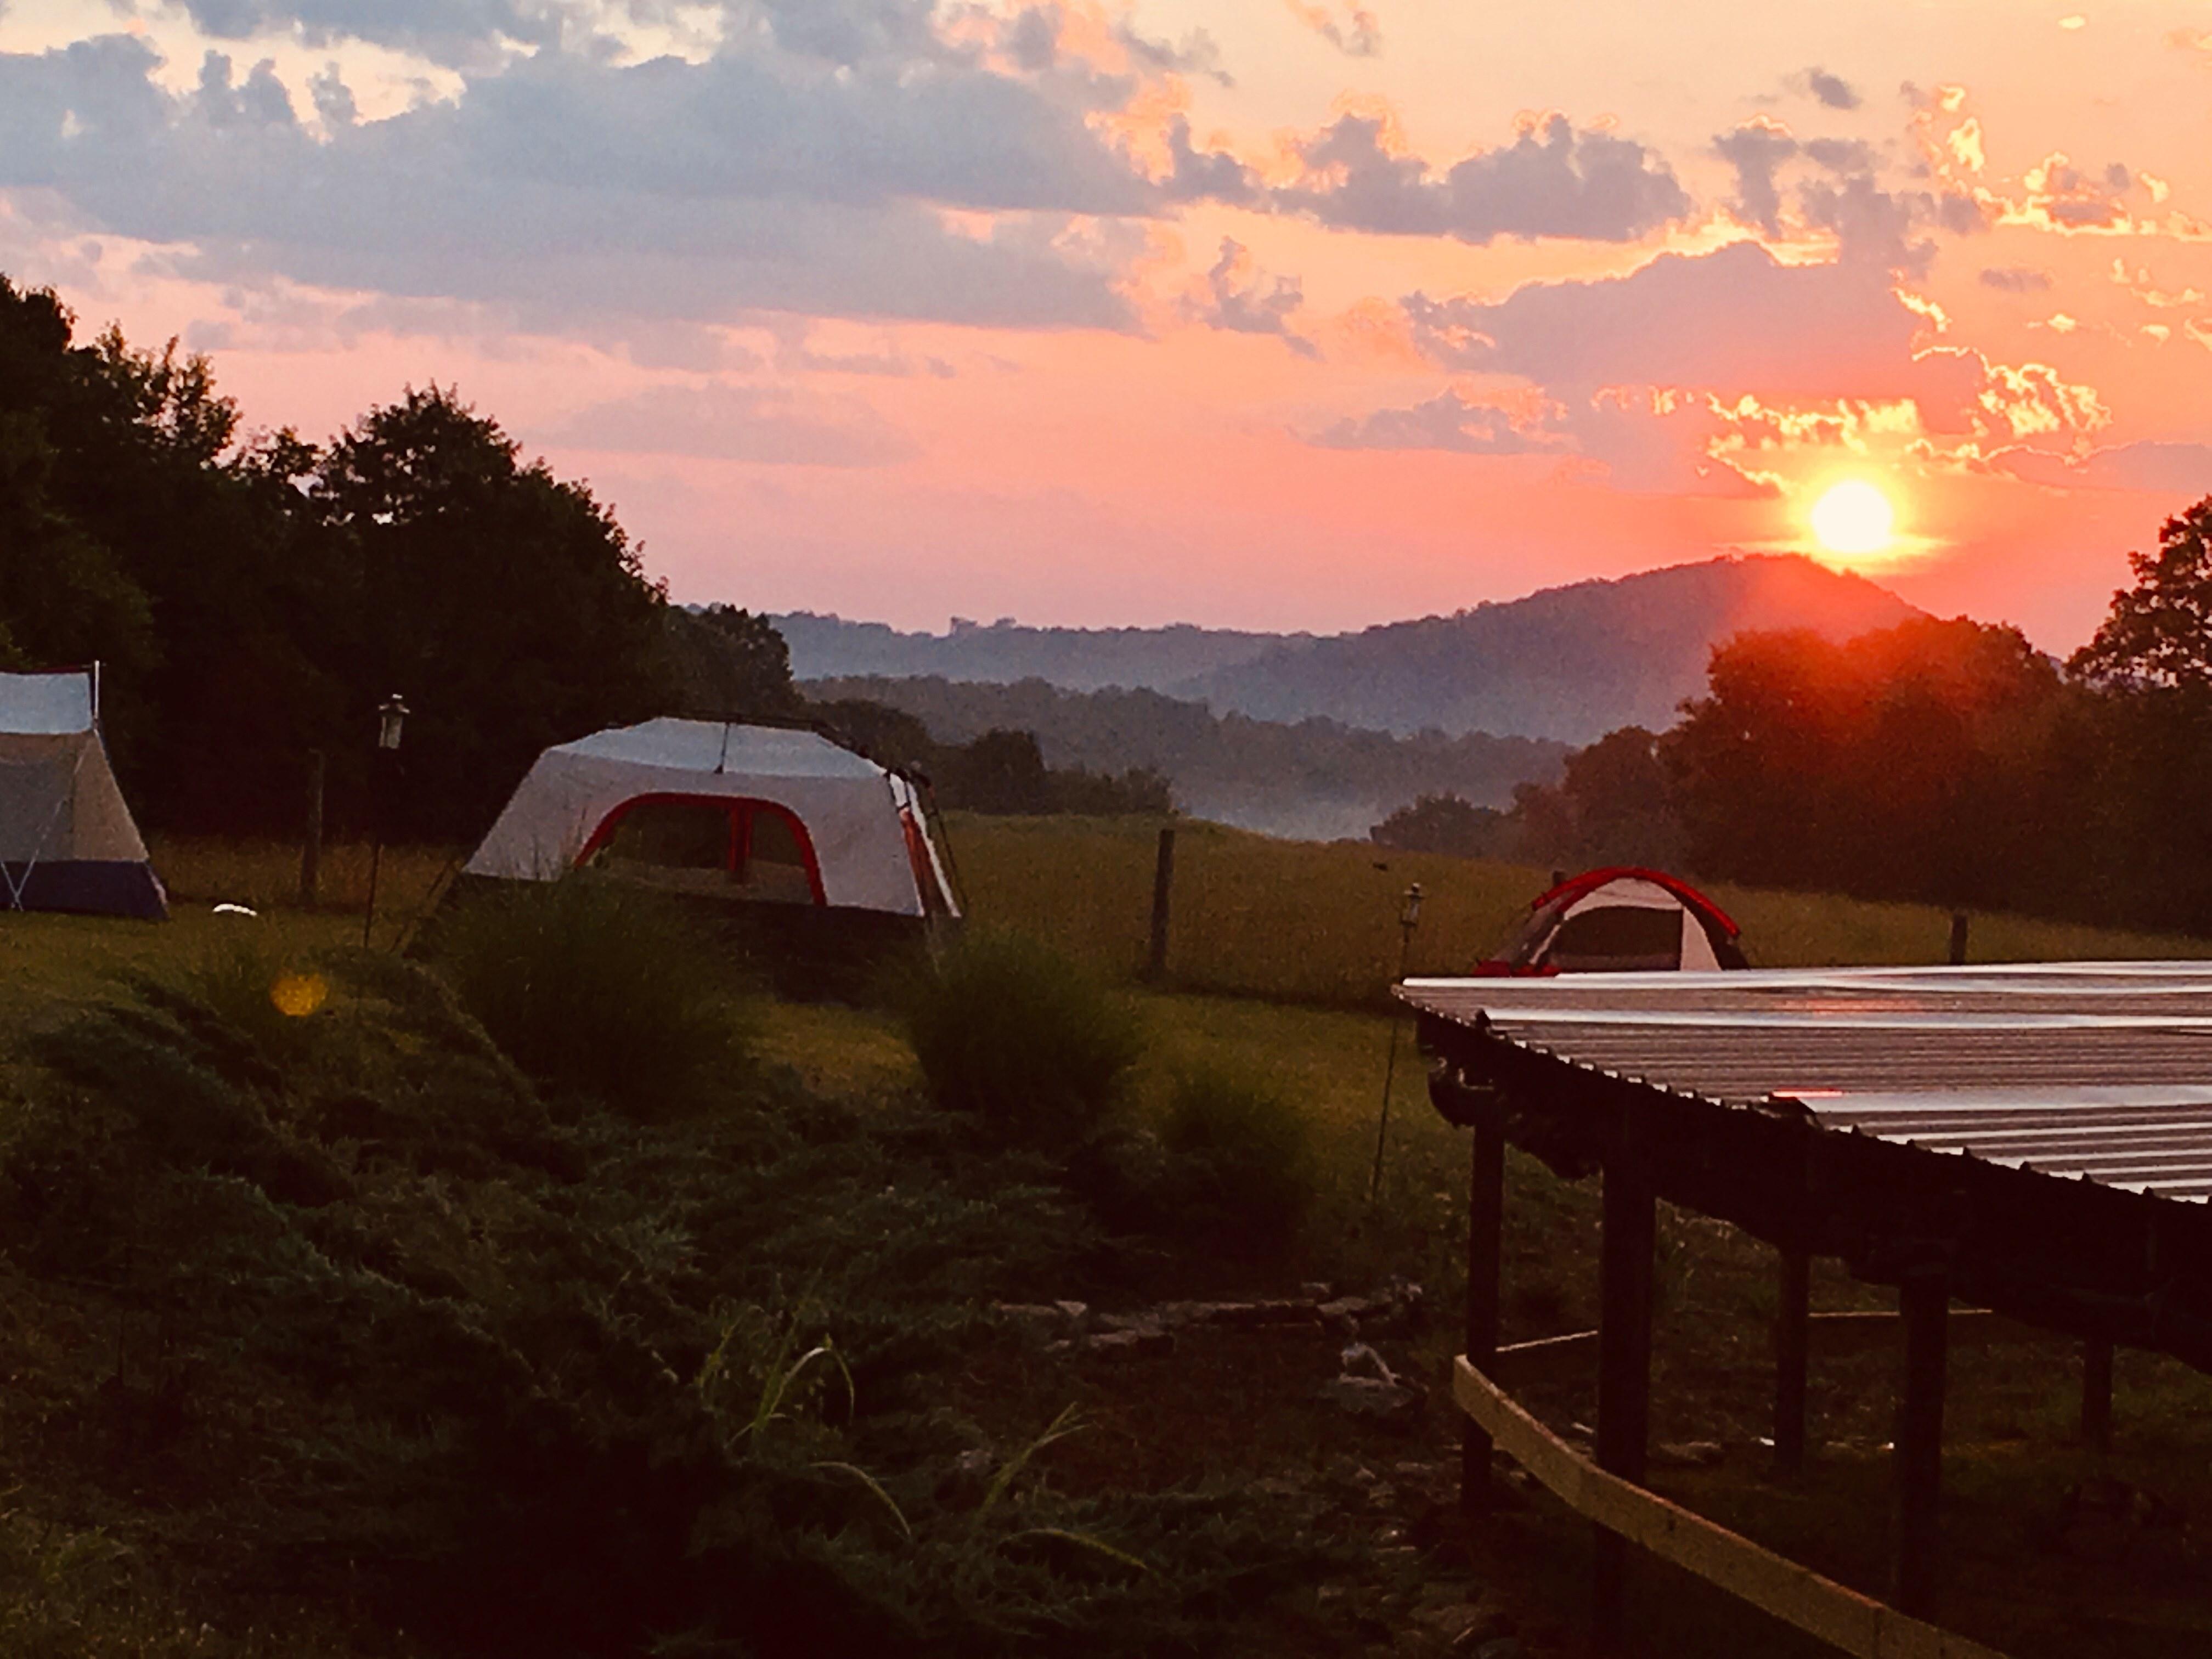 Sunset Buckeye pic